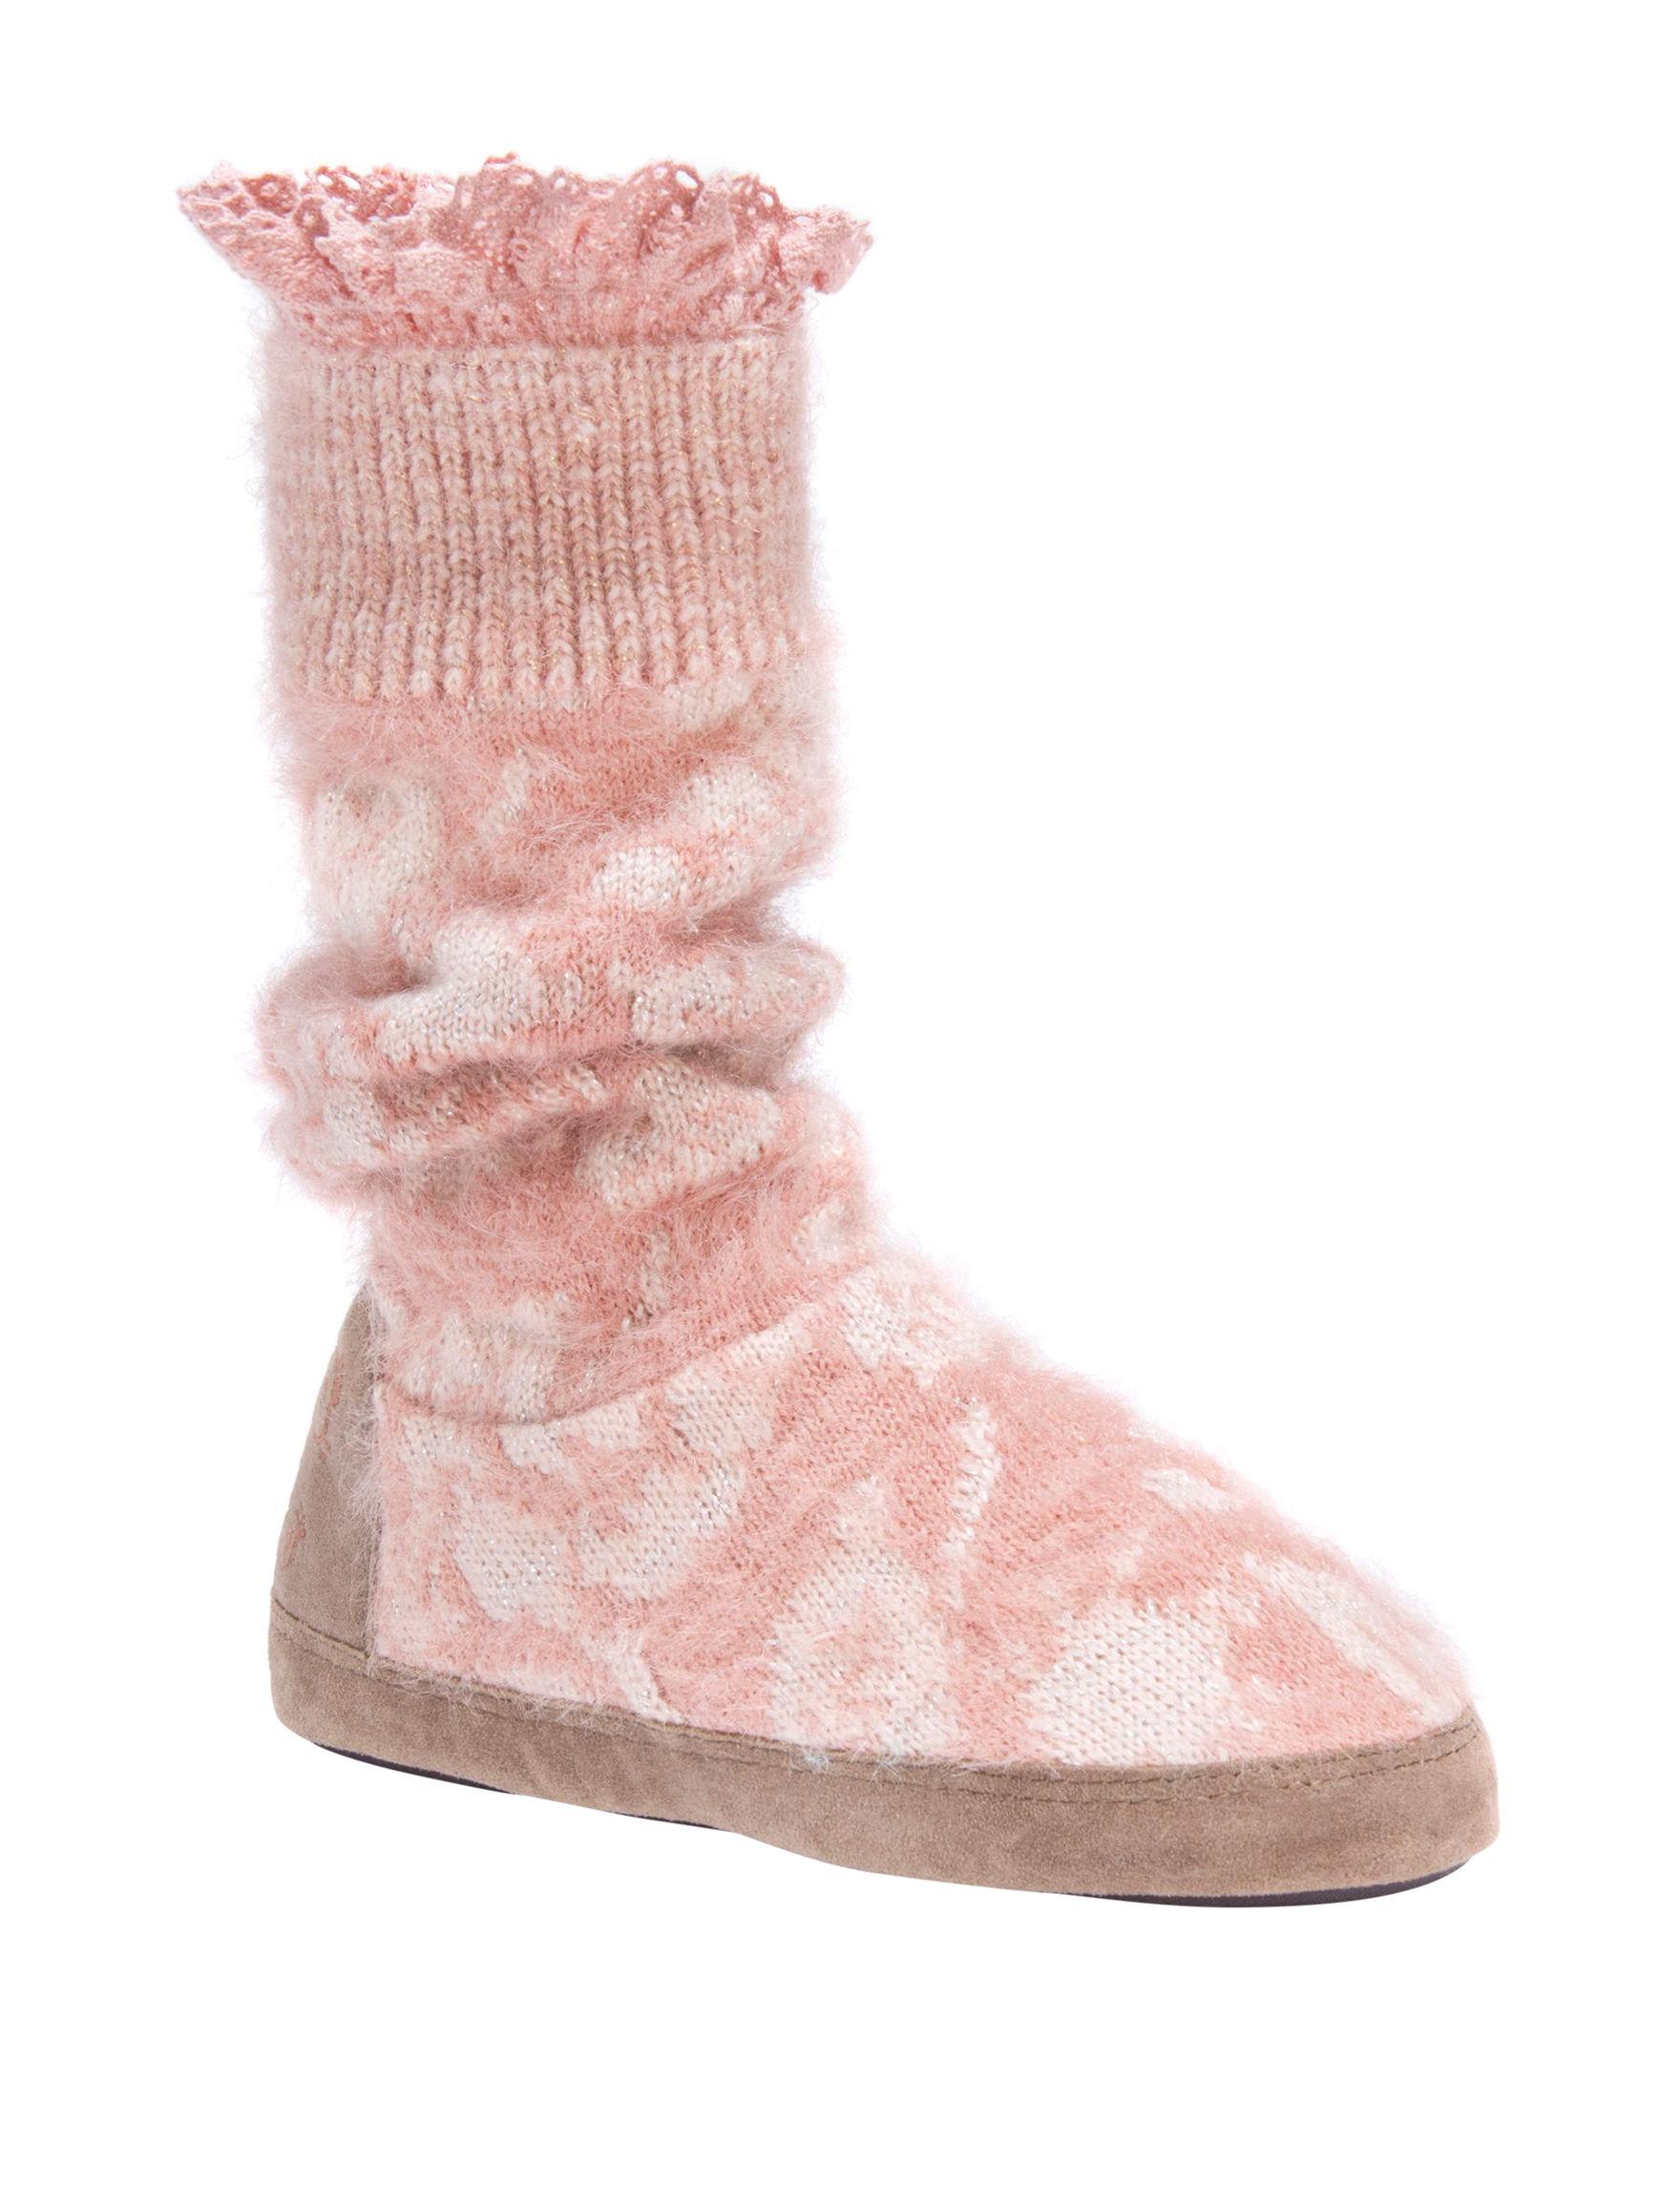 Muk Luks Rose Gold Slipper Boots & Booties